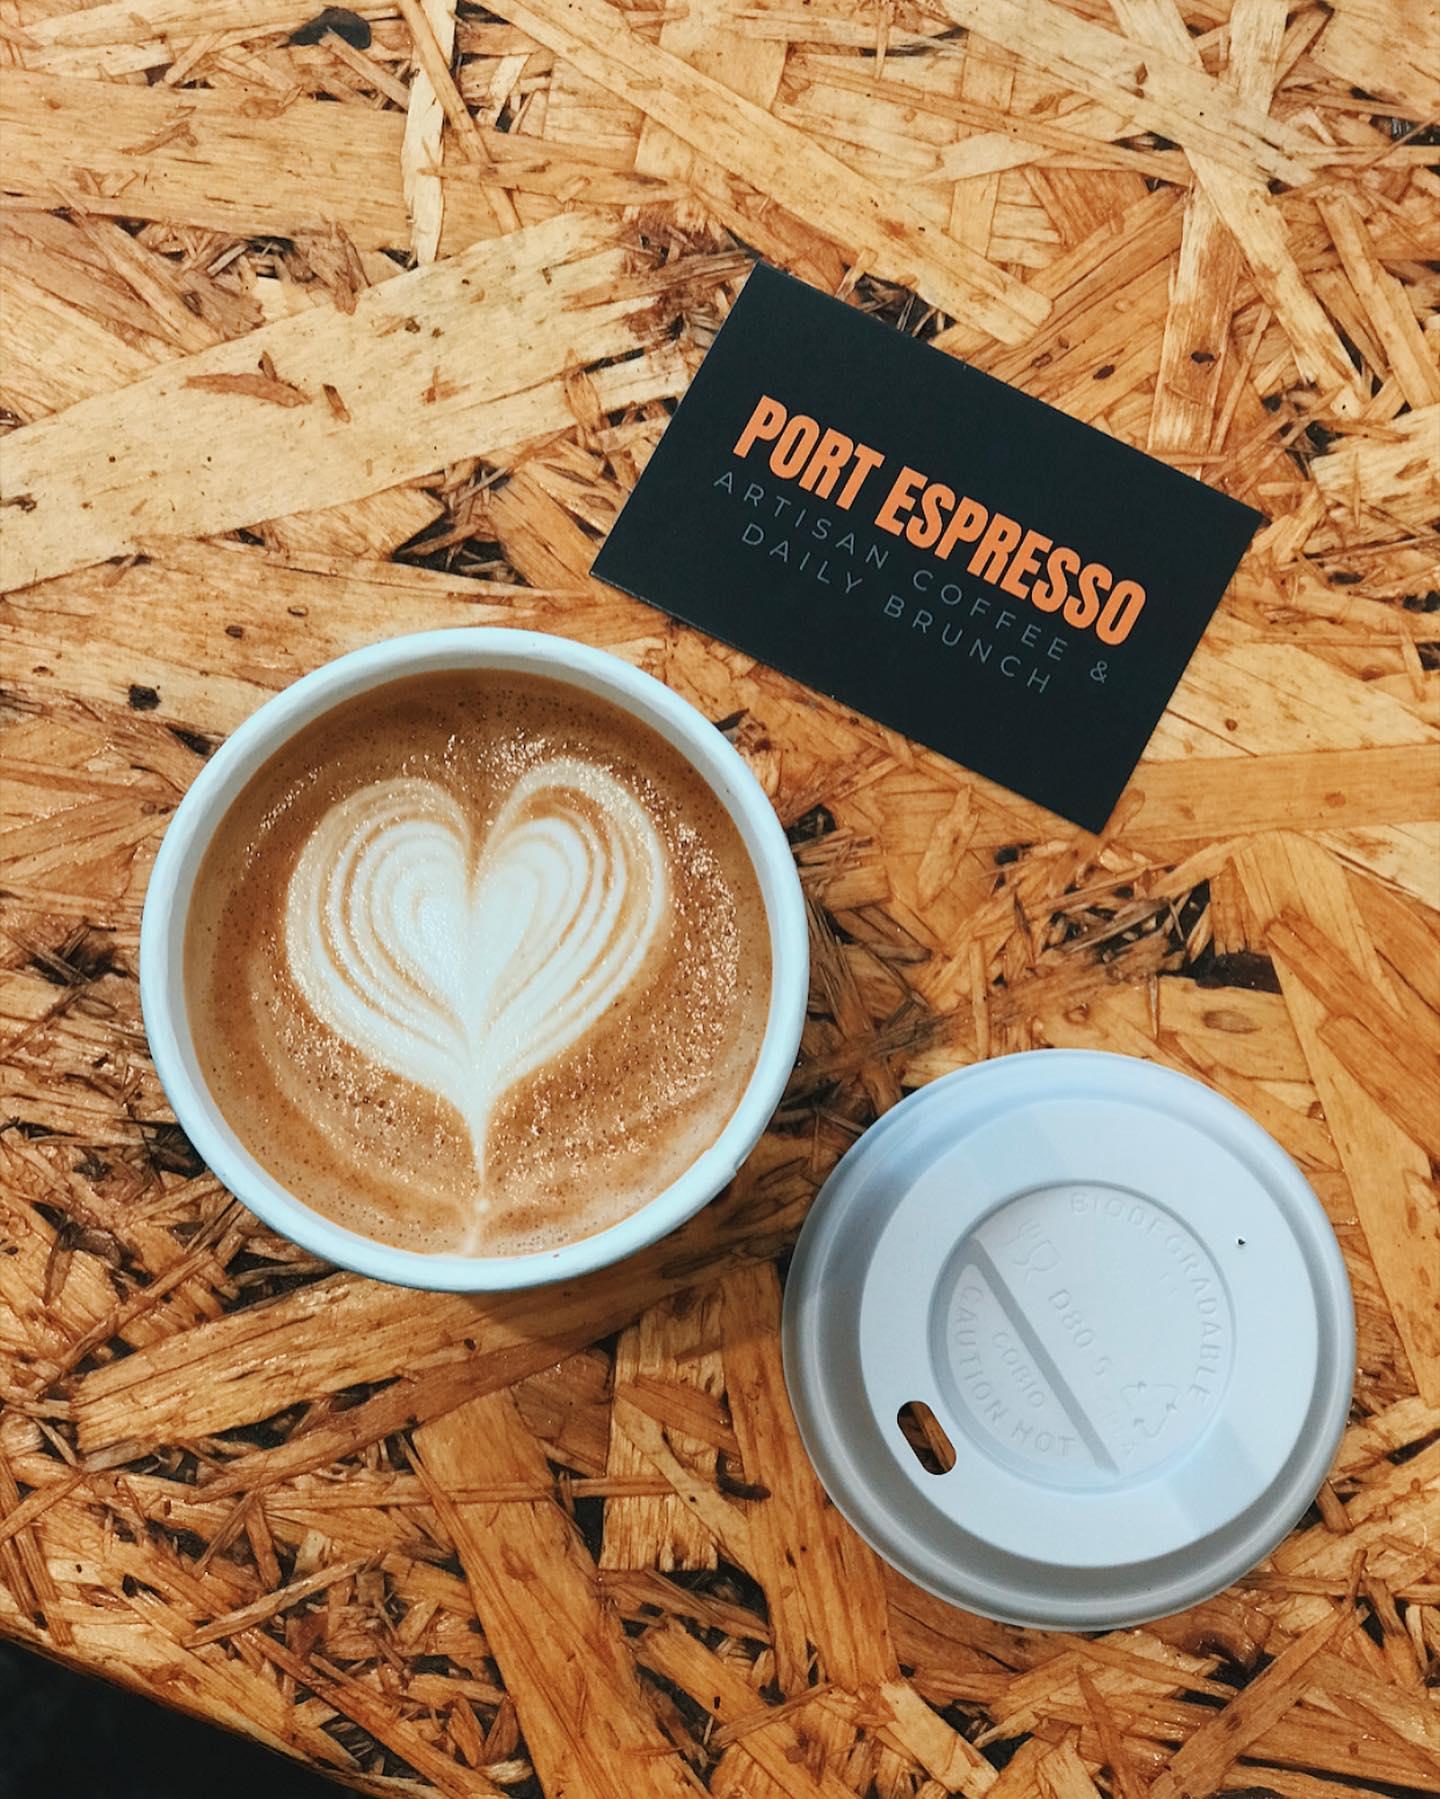 port-espresso-coffee